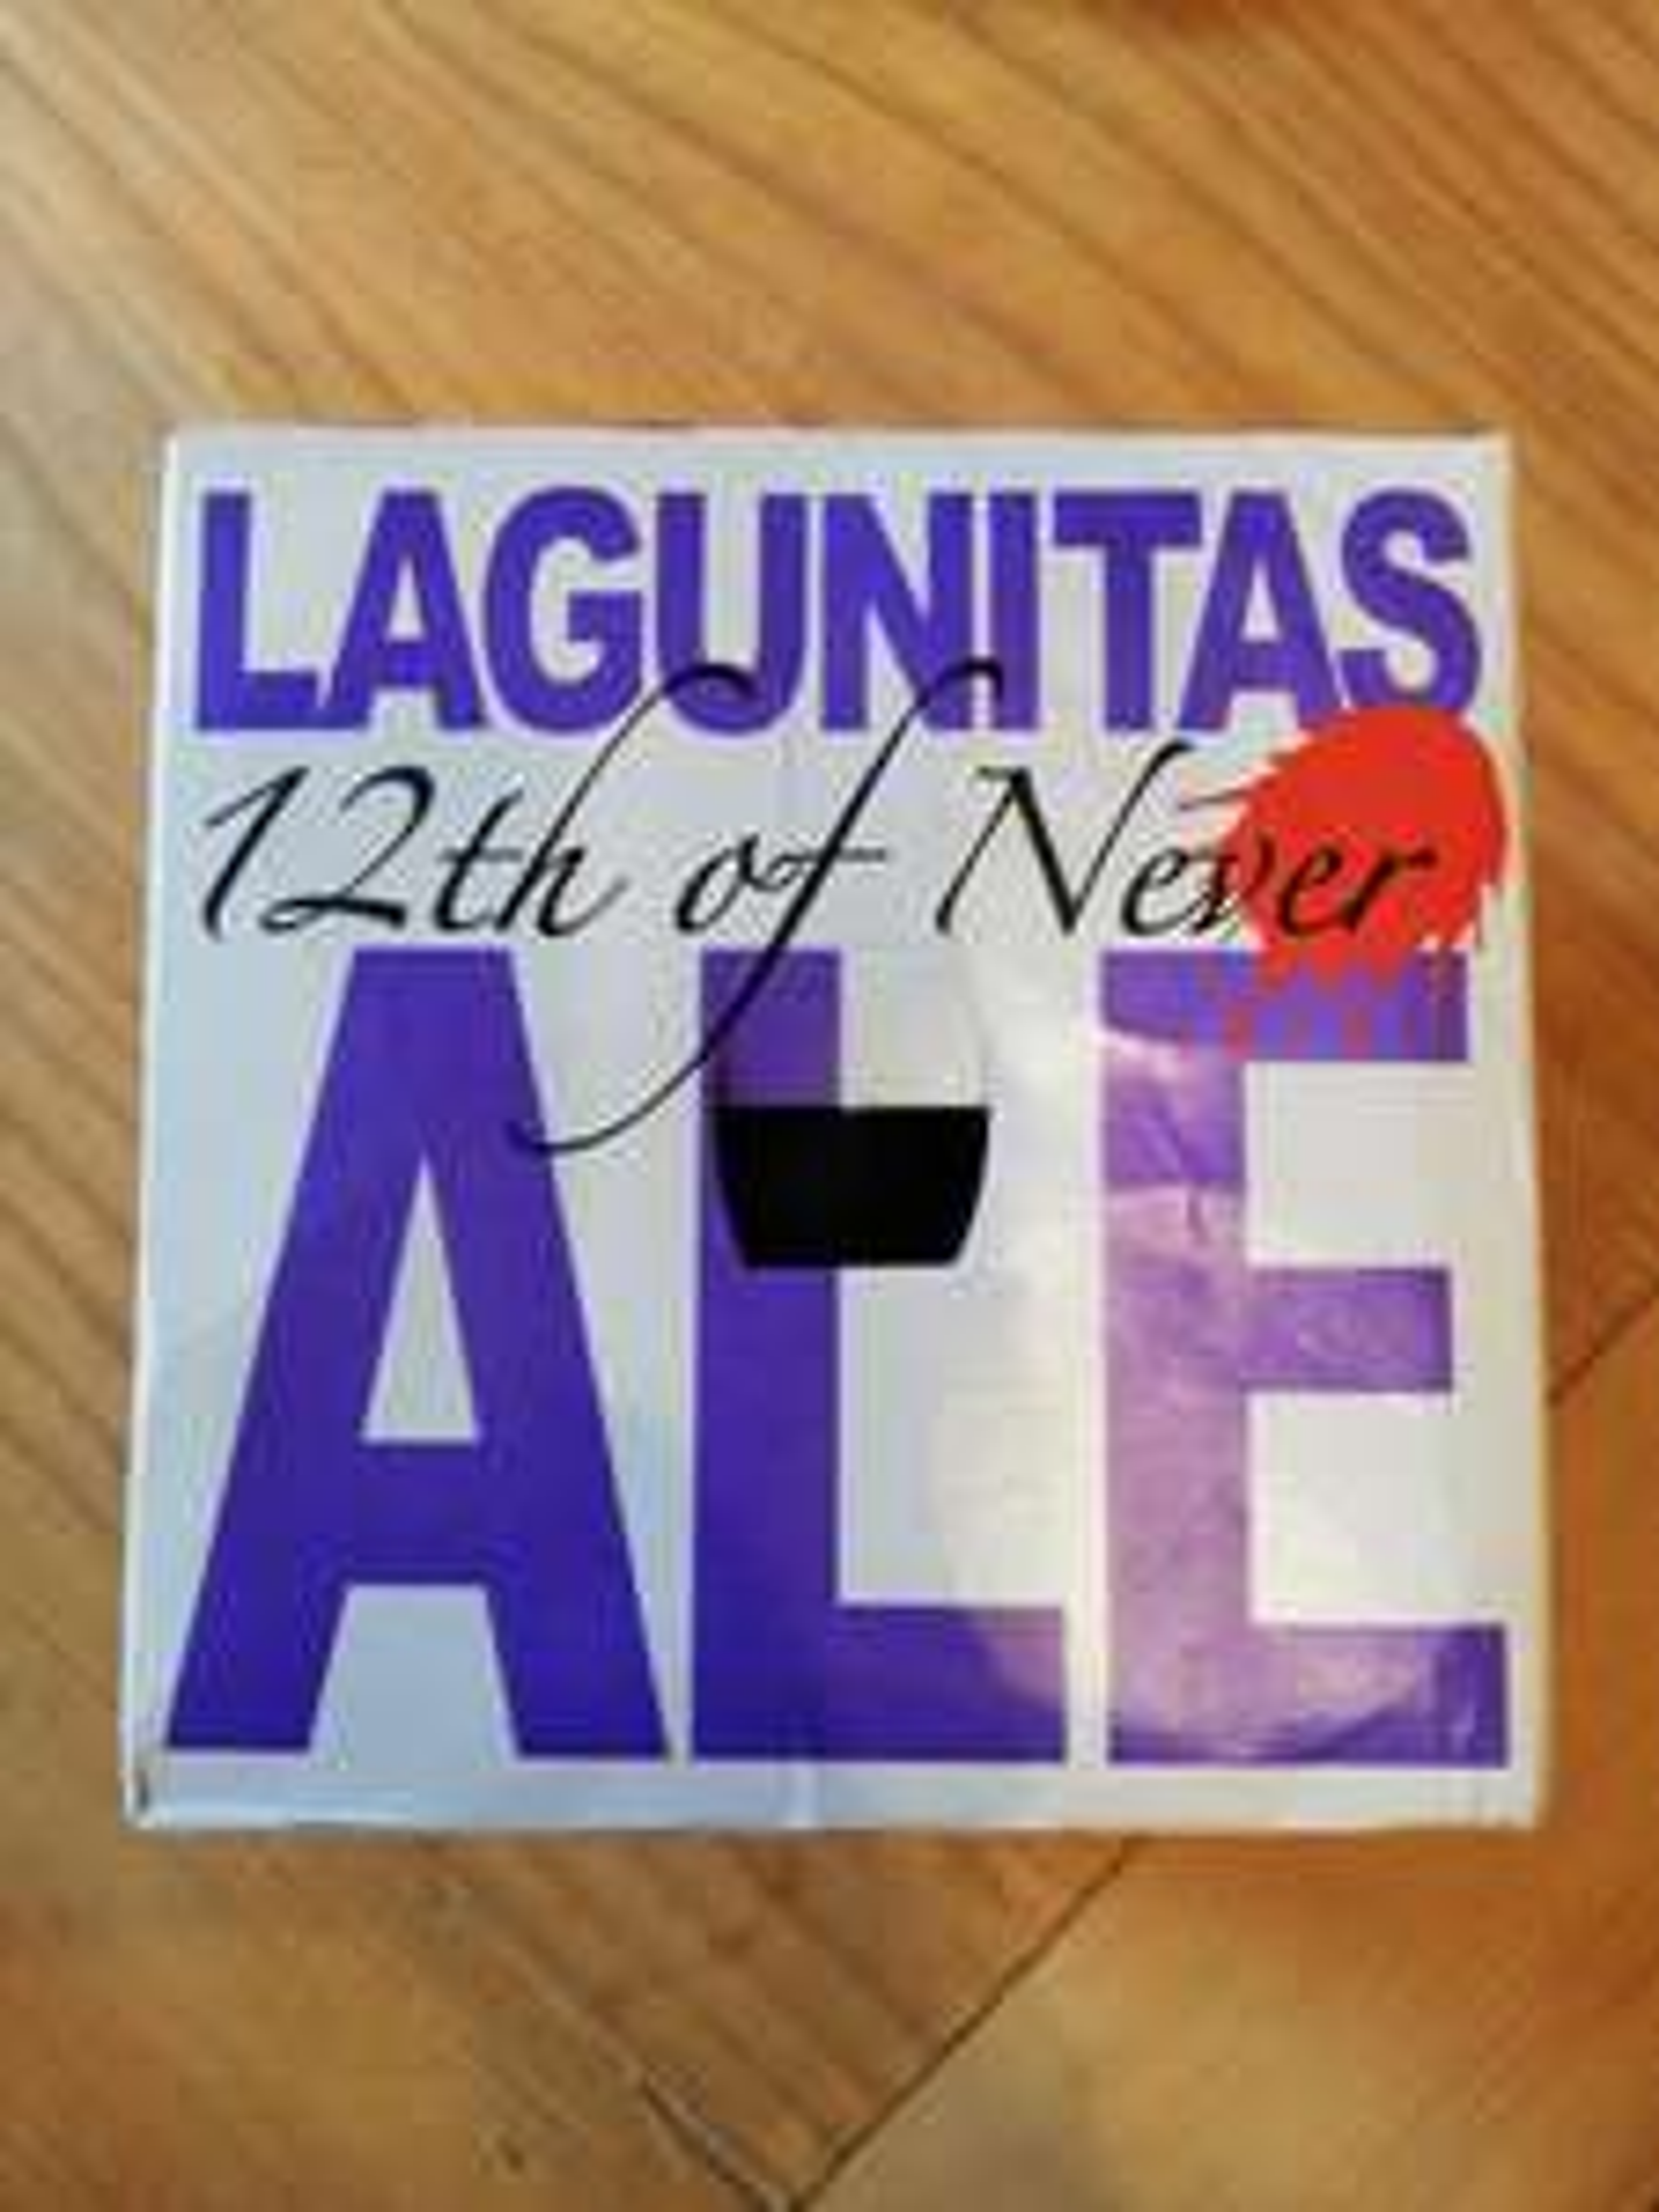 Lagunitas 12th of Never Ale 4pk £2.99 @ Home Bargains